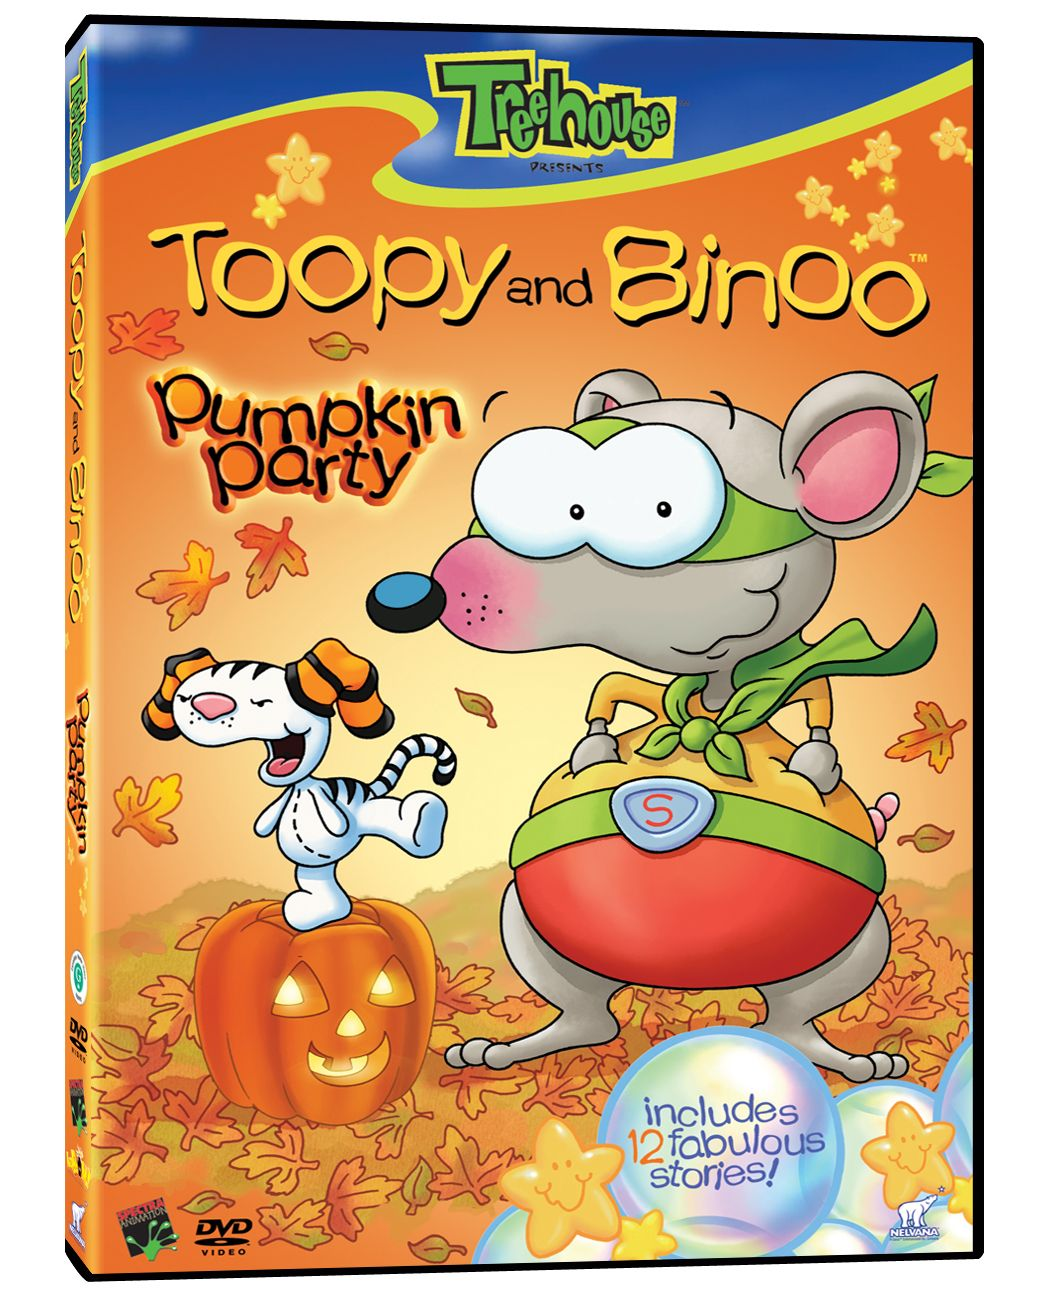 Toopy & Binoo Pumpkin Party Pumpkin party, Halloween